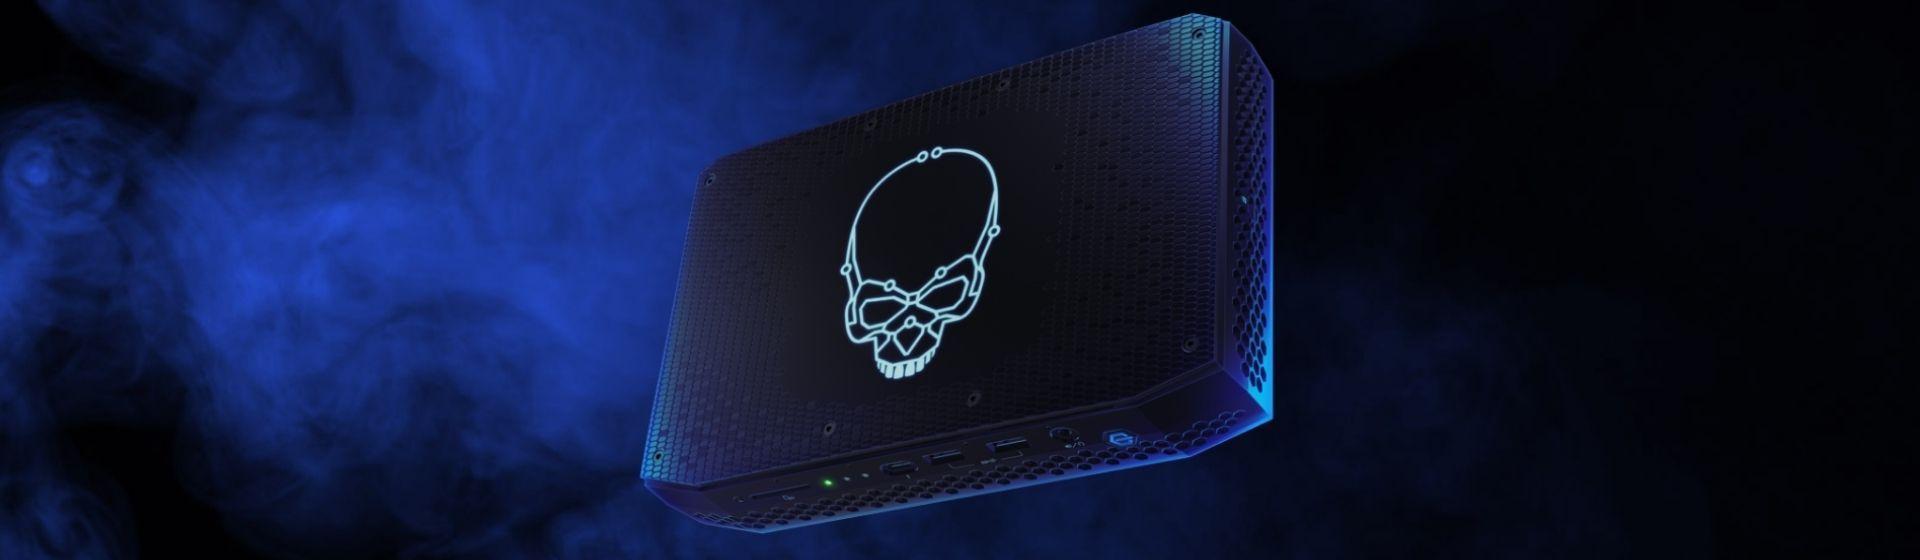 Intel NUC 11 Enthusiast: o PC gamer compacto com GeForce RTX 2060